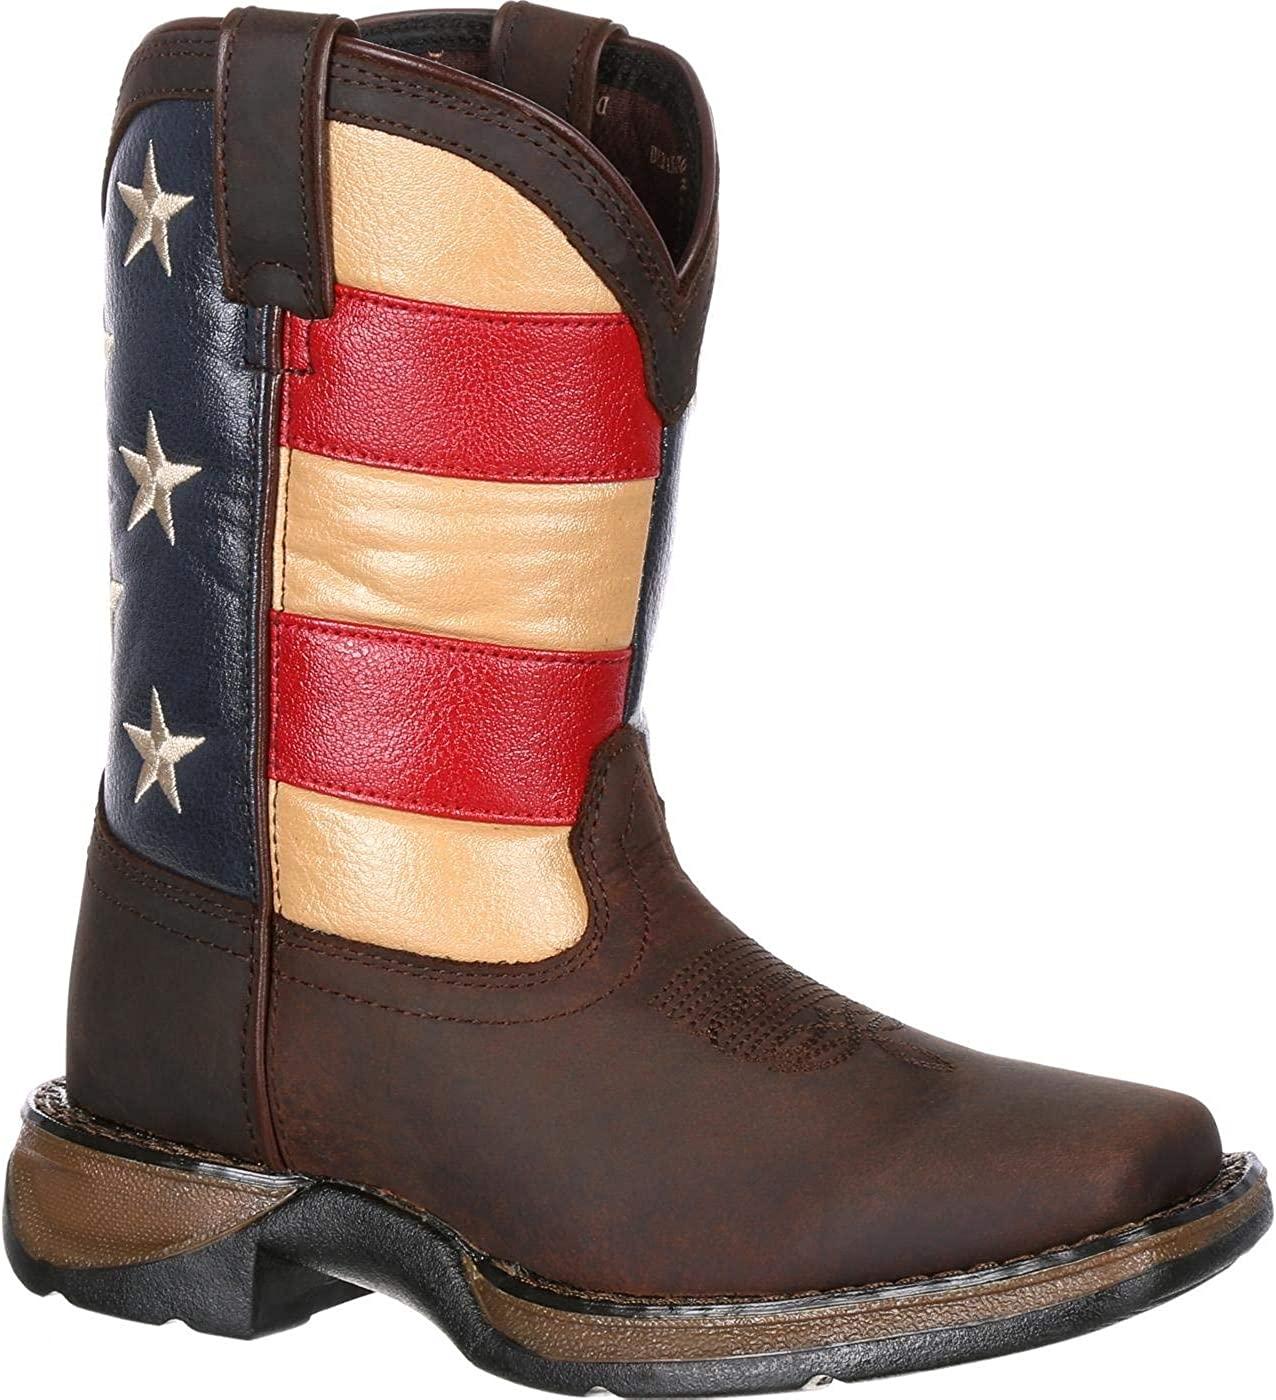 Durango Unisex DBT0160 Western Boot, Brown and Union Flag, 5 M US Big Kid